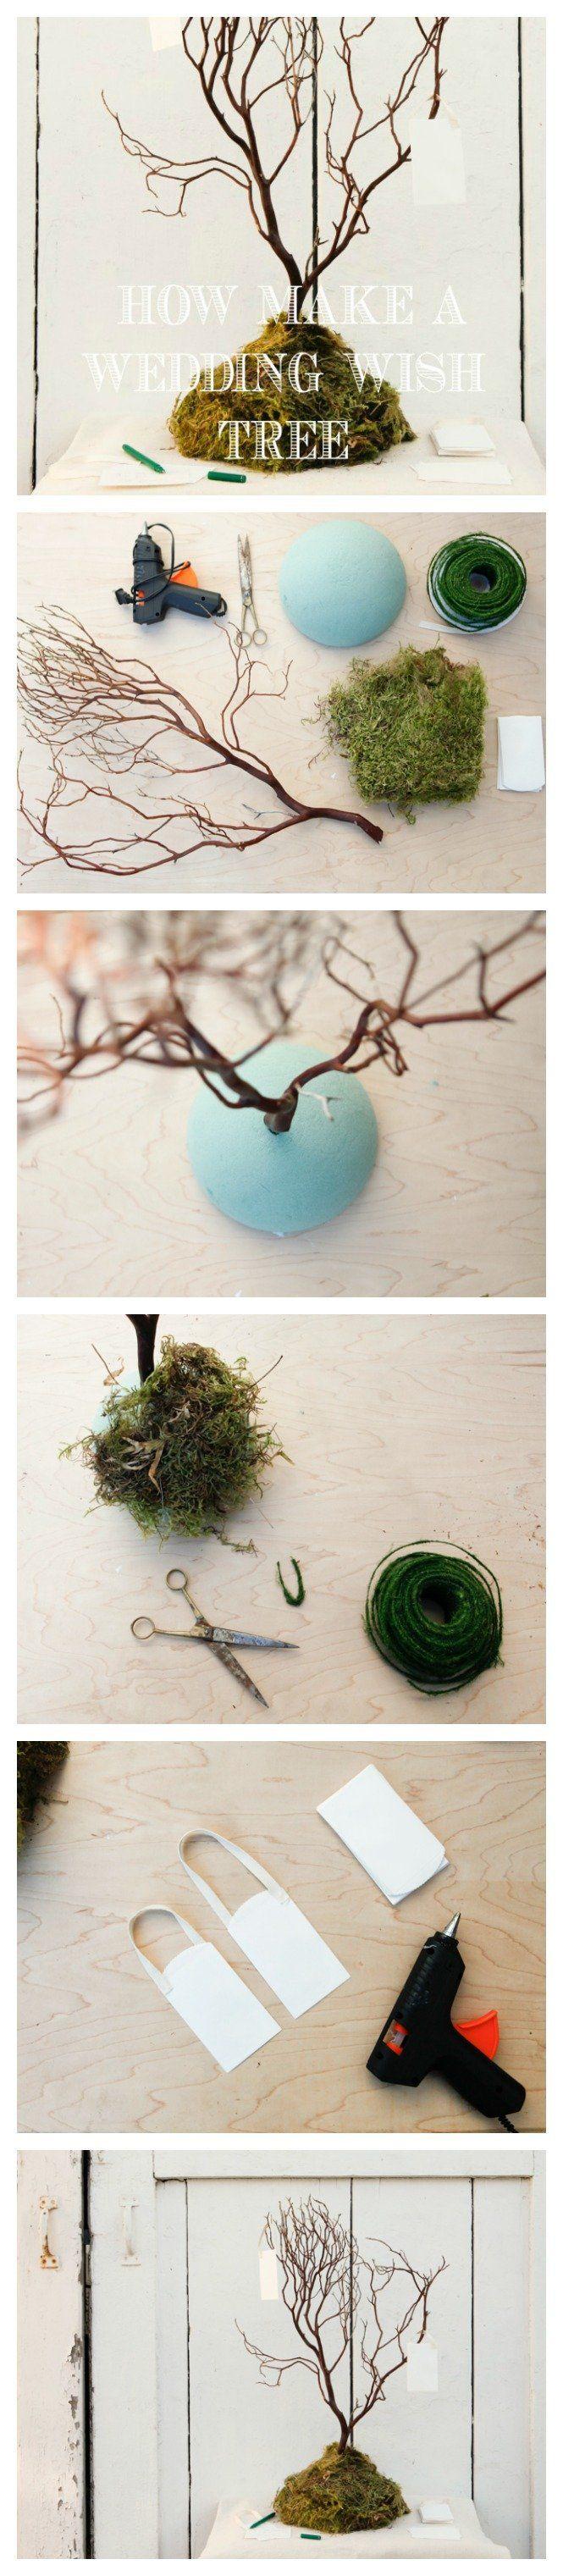 Step By Step : Wedding Wish Tree. [For Mum to make] :)